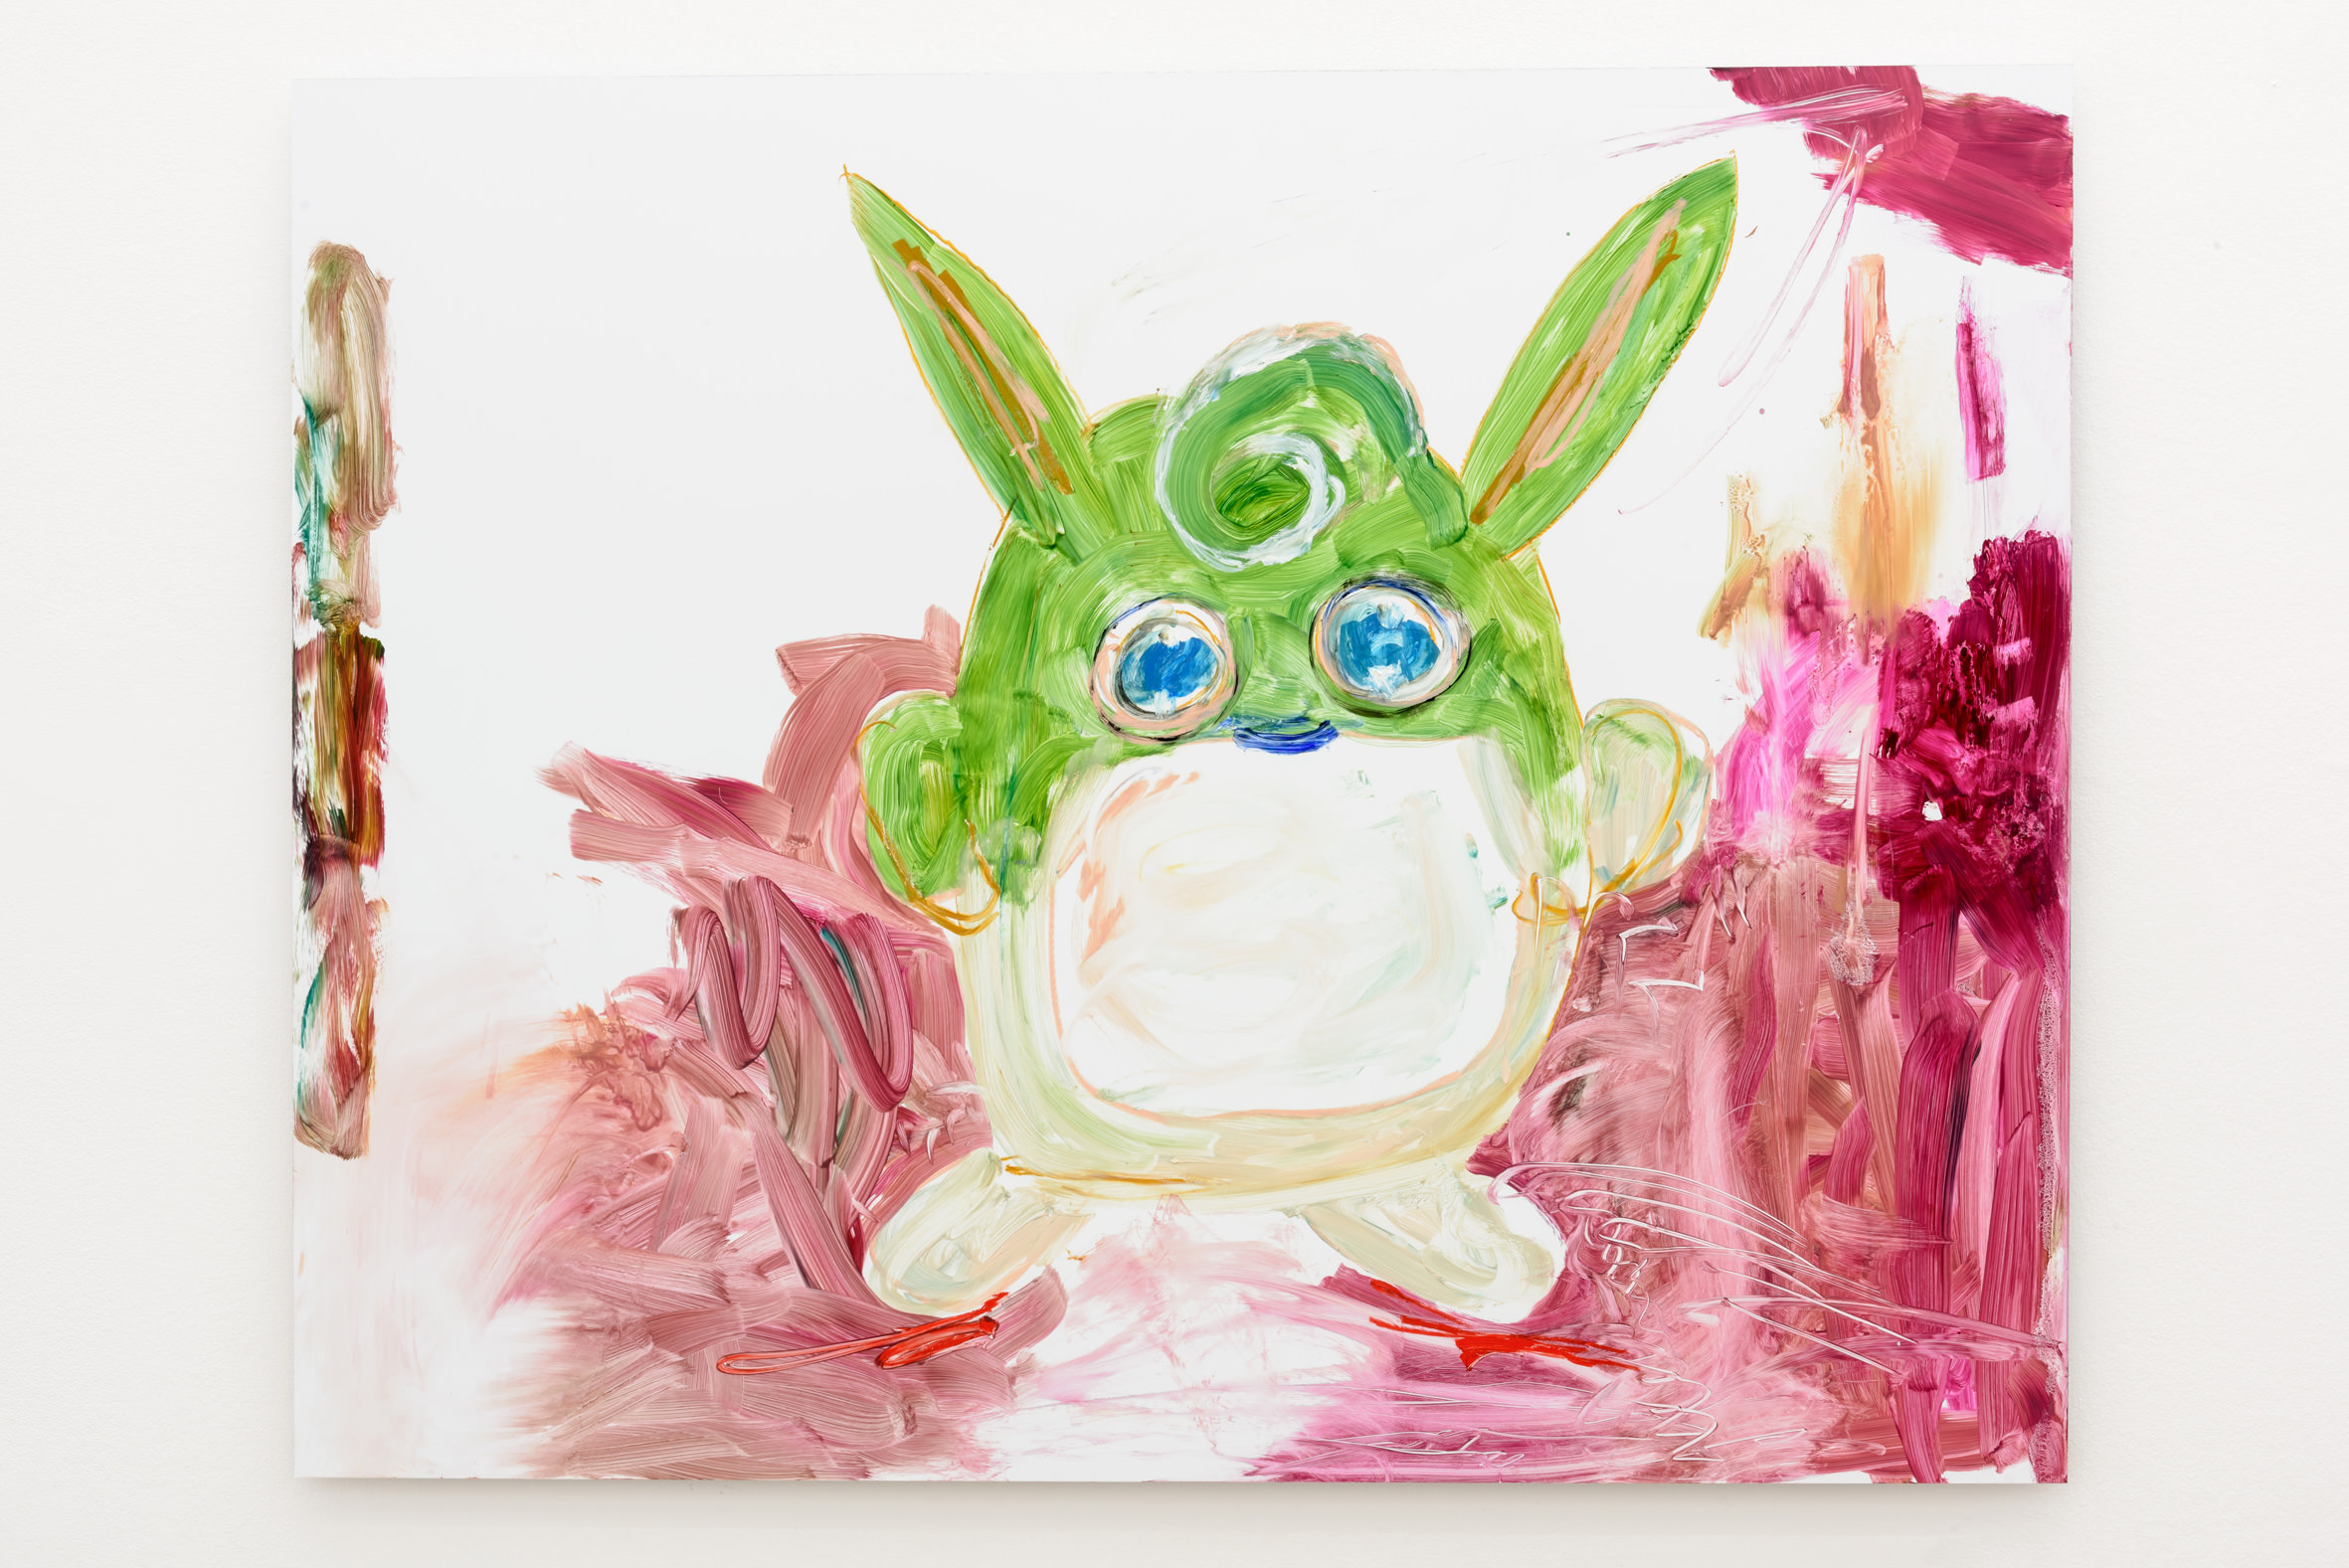 Reena Spaulings,Wigglystuff(2016).Peinture à l'huile sur Dibond. 100 x 130 cm. Courtesy of the artist and Galerie Chantal Crousel, Paris Photo: Florian Kleinefenn